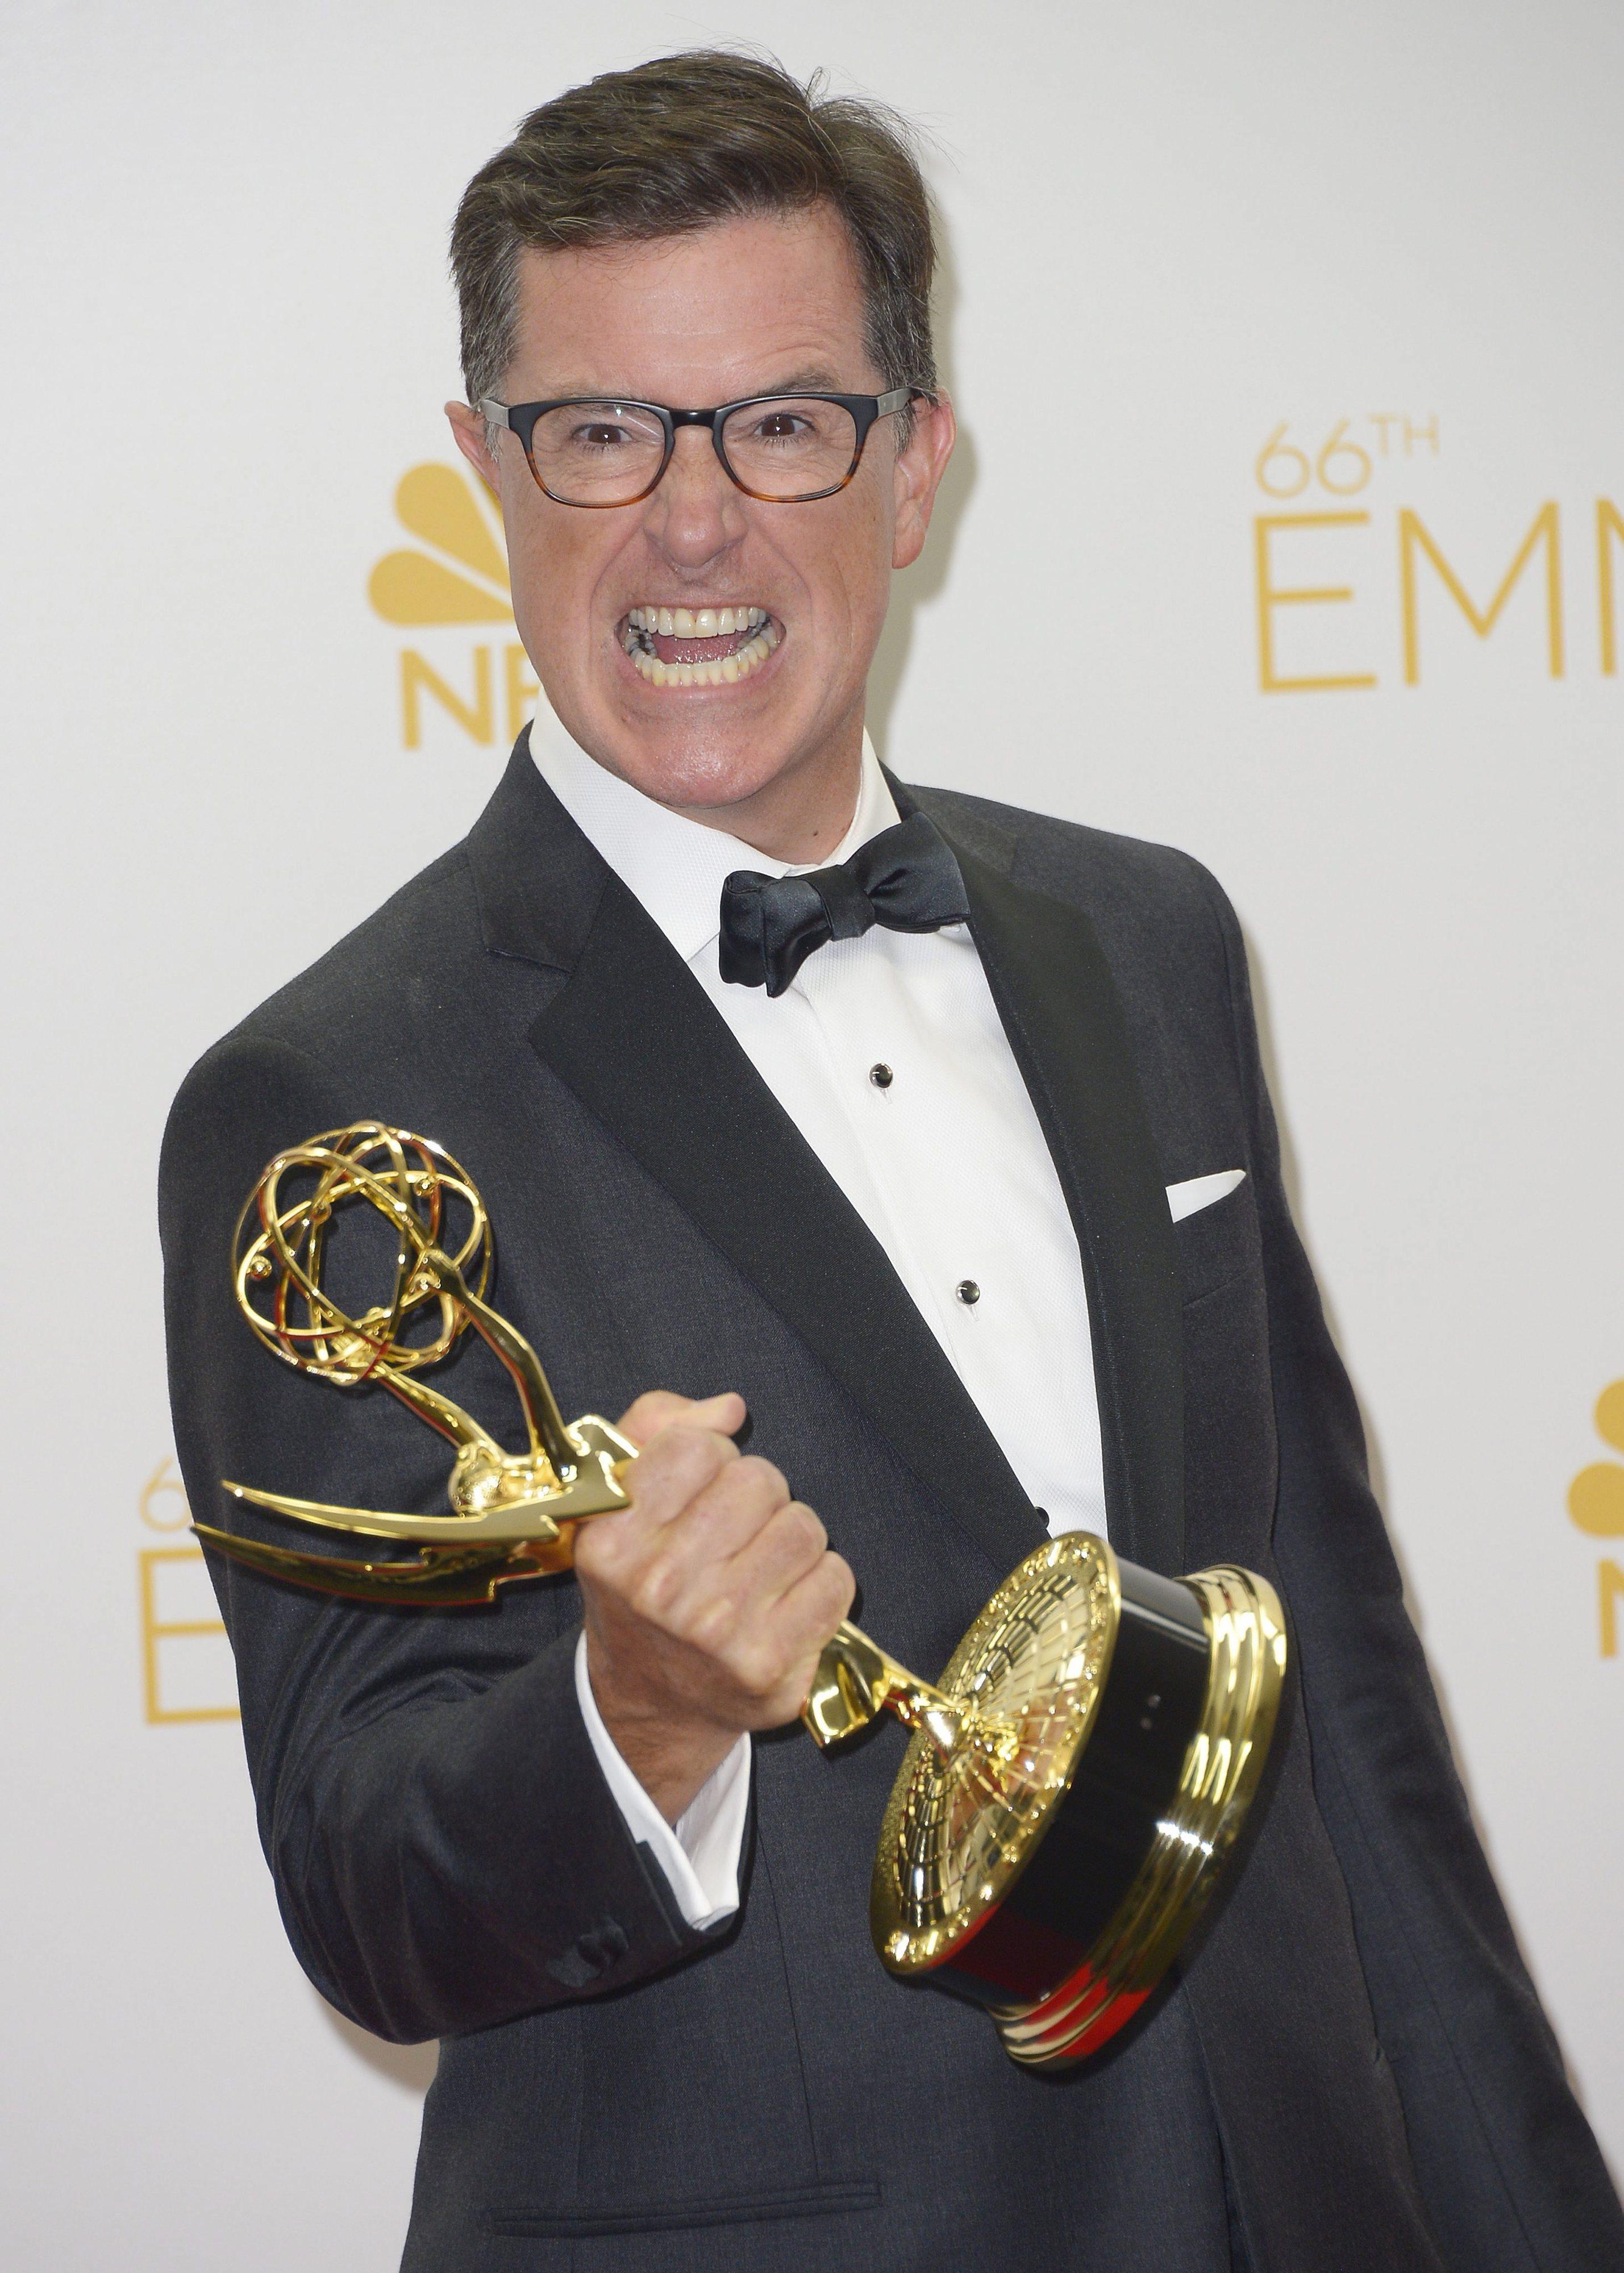 Stephen Colbert vai apresentar a cermónia dos Emmys